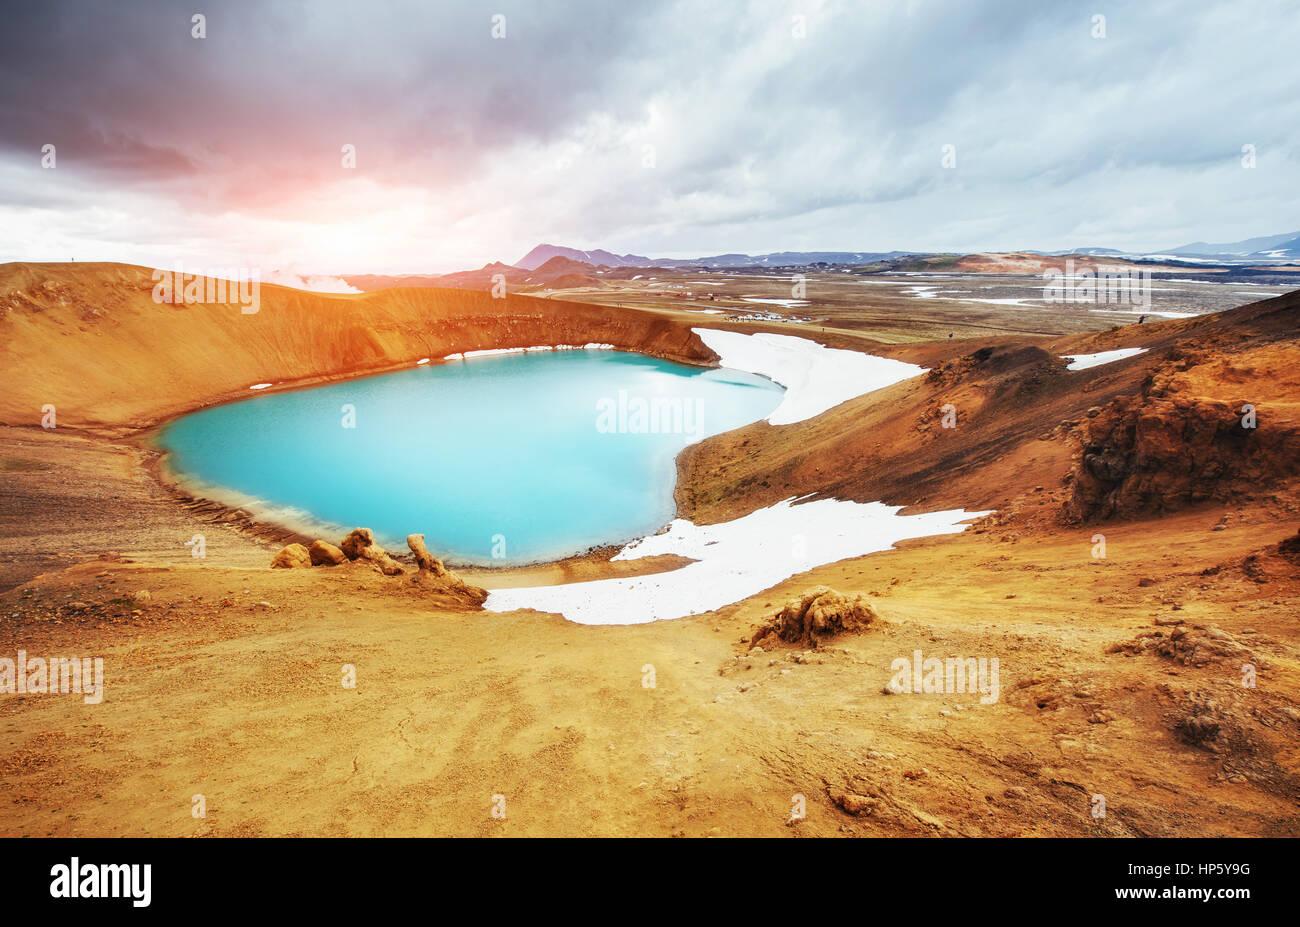 Volcán gigante domina. Brinda un cálido color turquesa wa geotérmica Imagen De Stock